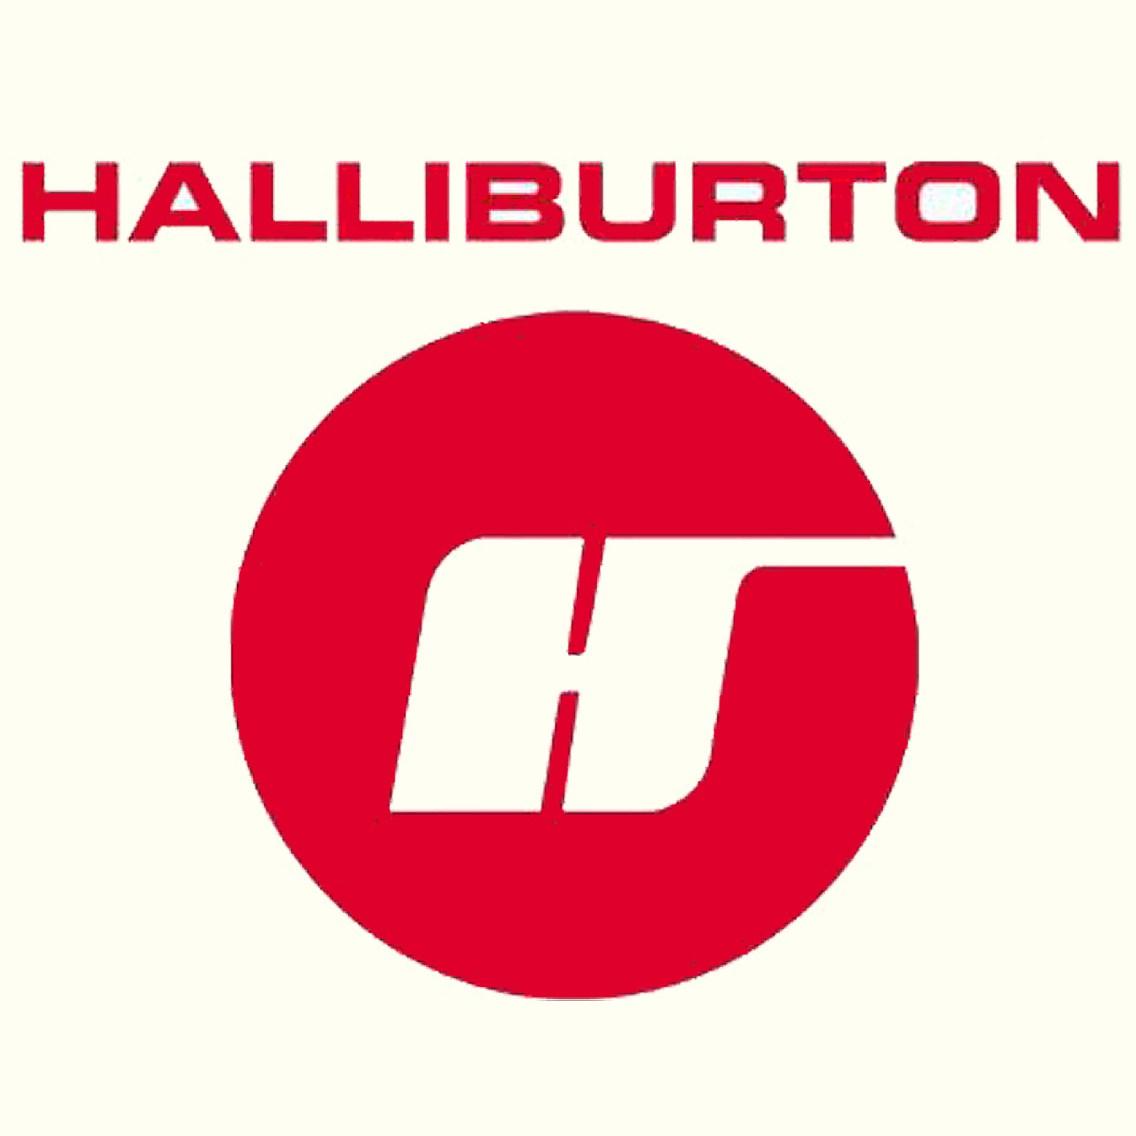 Halliburton: Take The Profits And Wait For The Next Leg Down (NYSE:HAL)